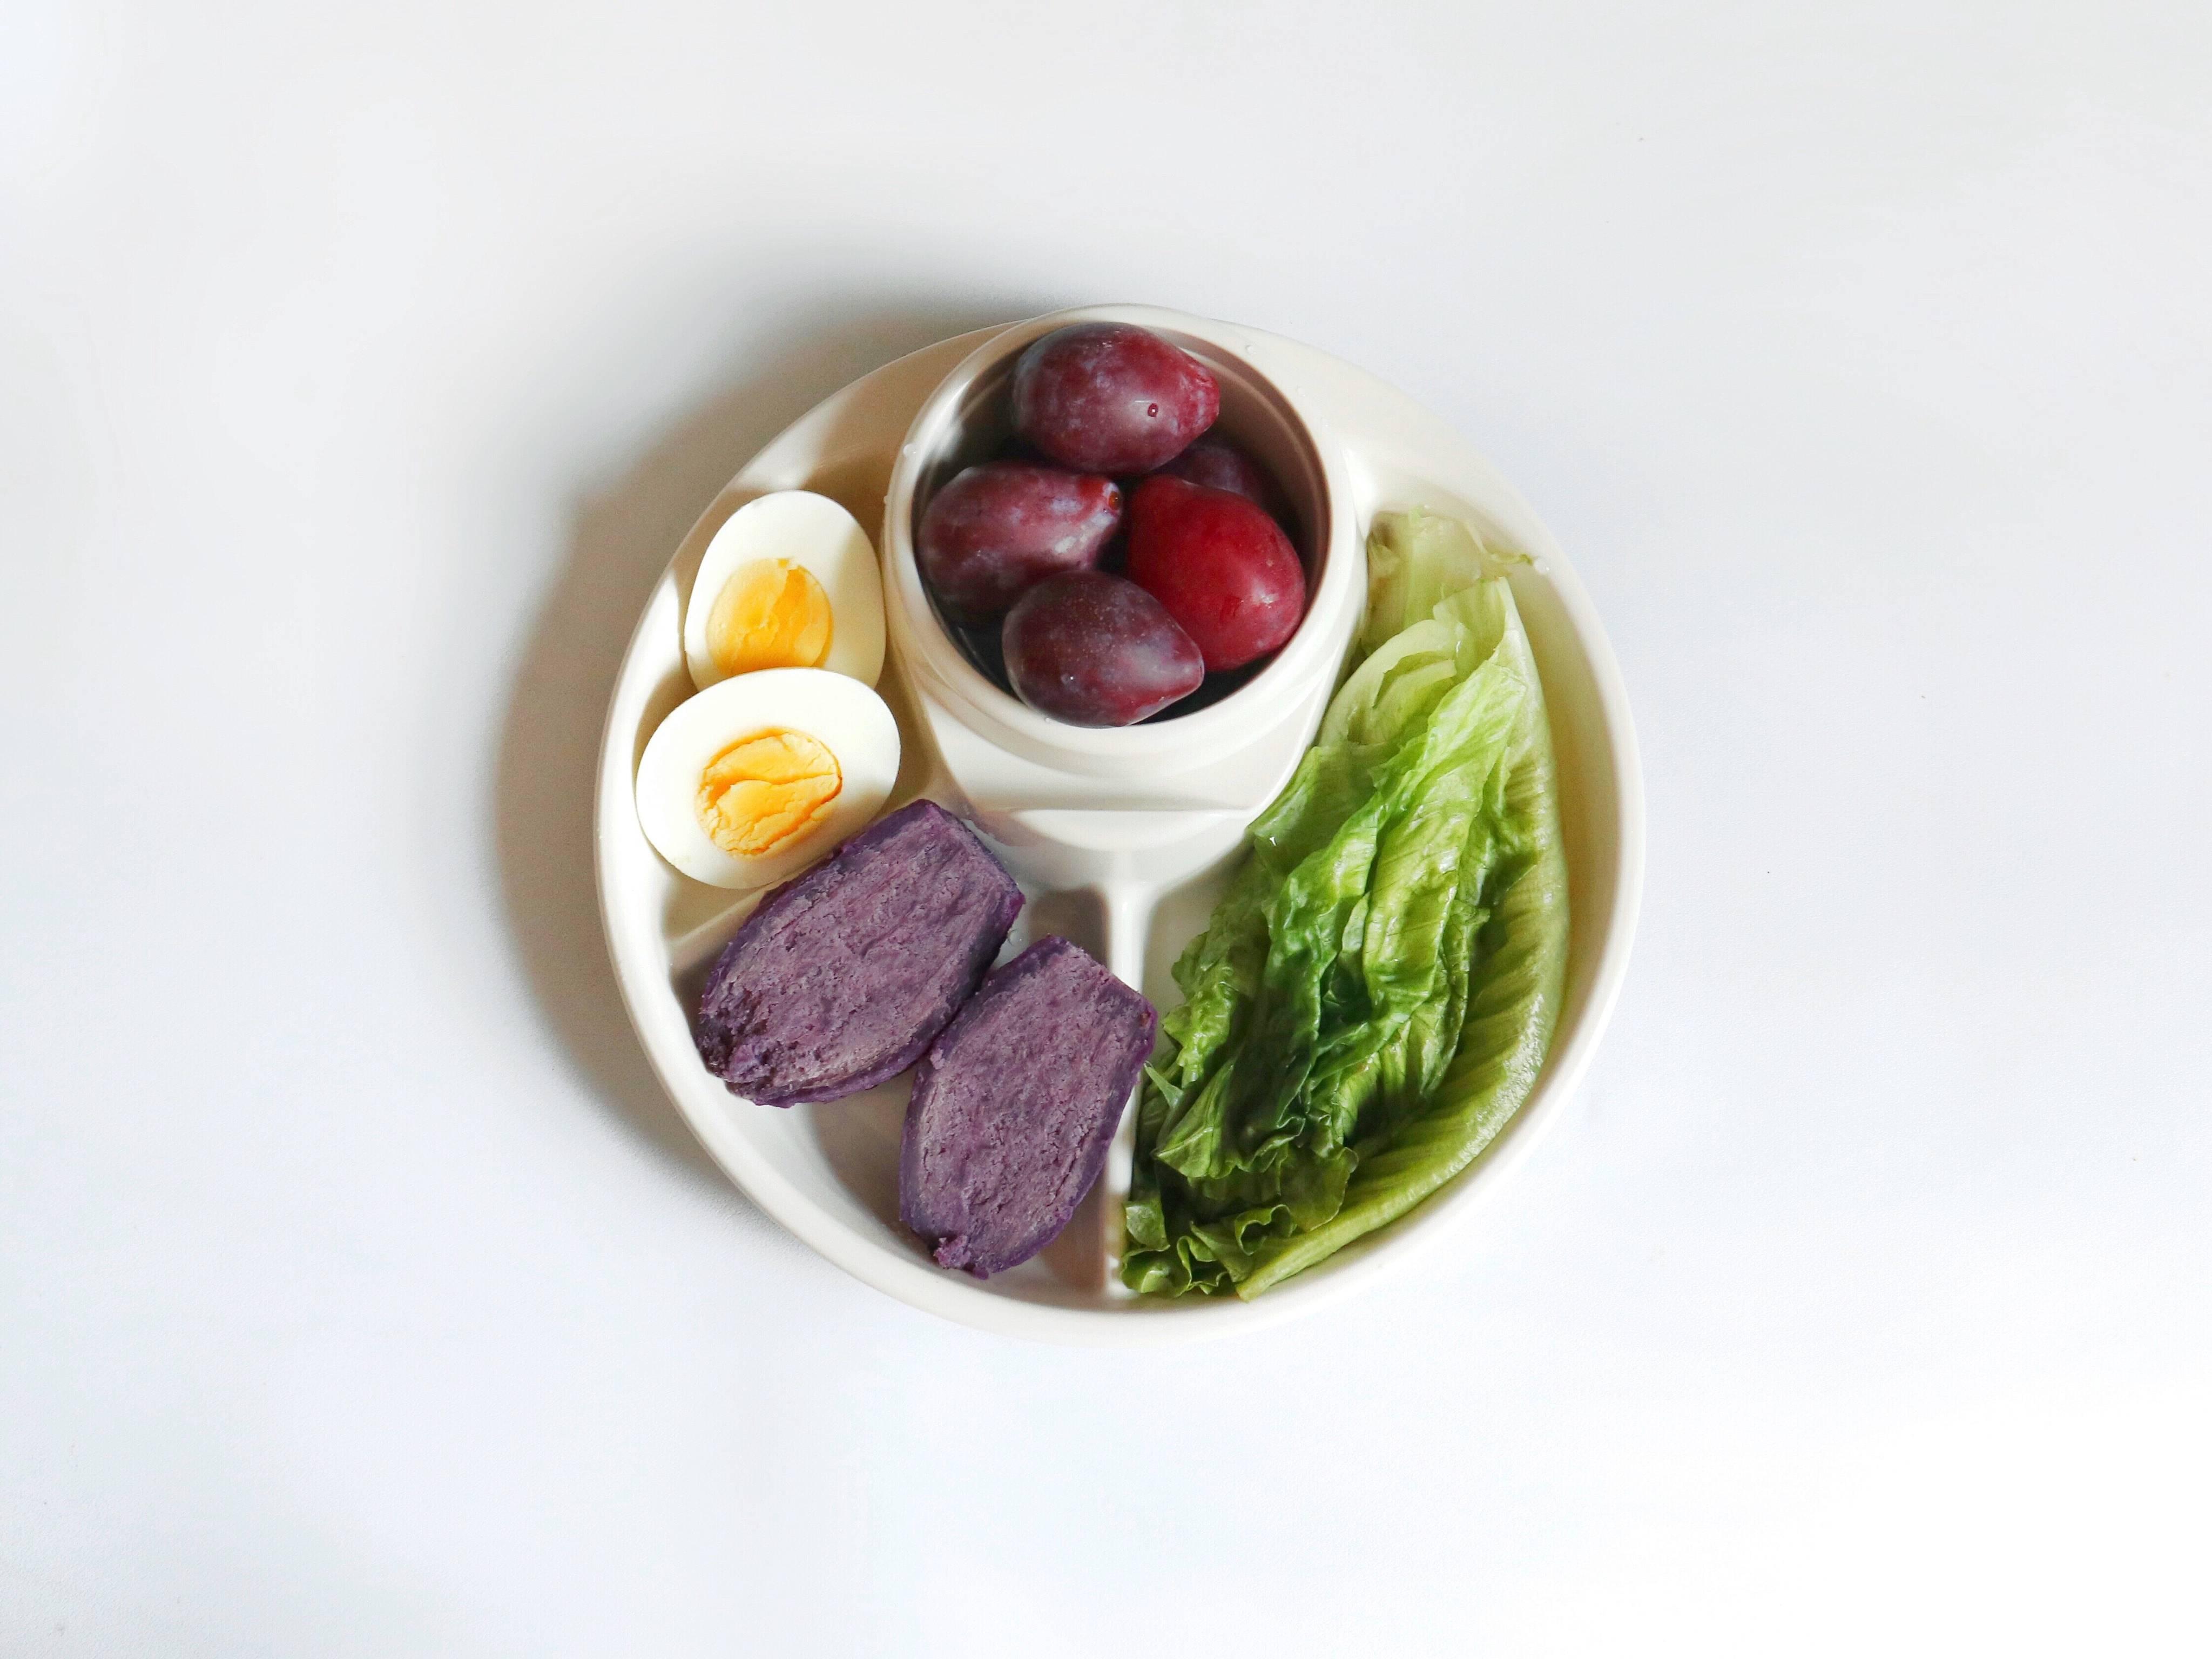 ㊙️一周减脂早餐 简单料理 低卡又健康的做法 步骤5